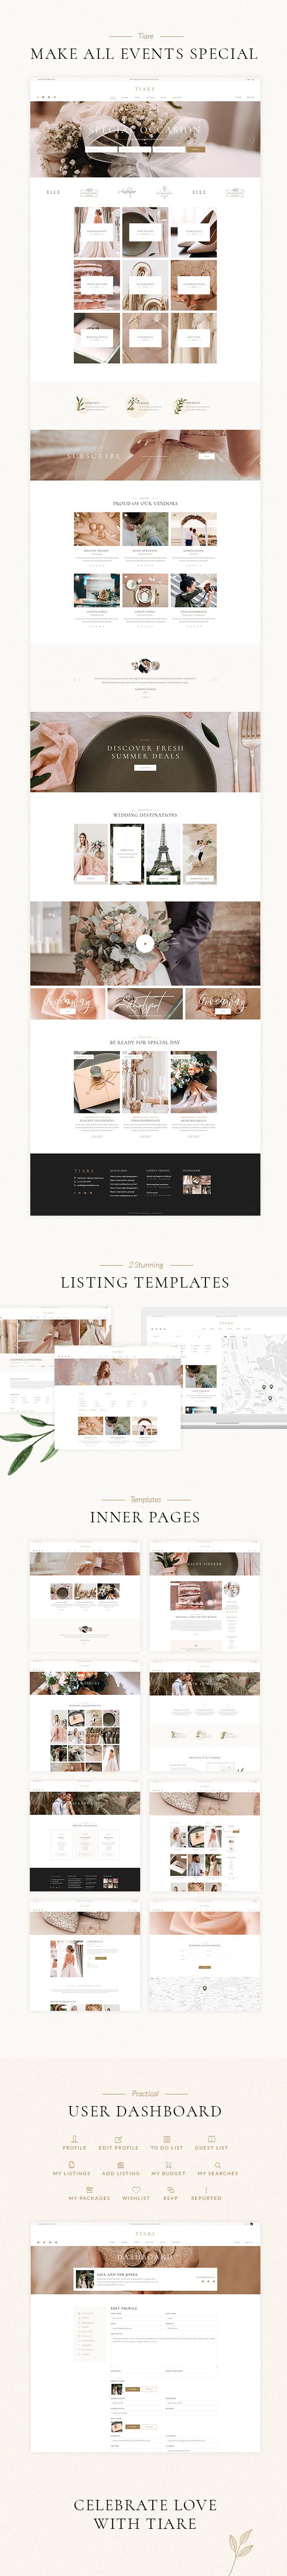 Tiare - Wedding Vendor Directory Theme - 1